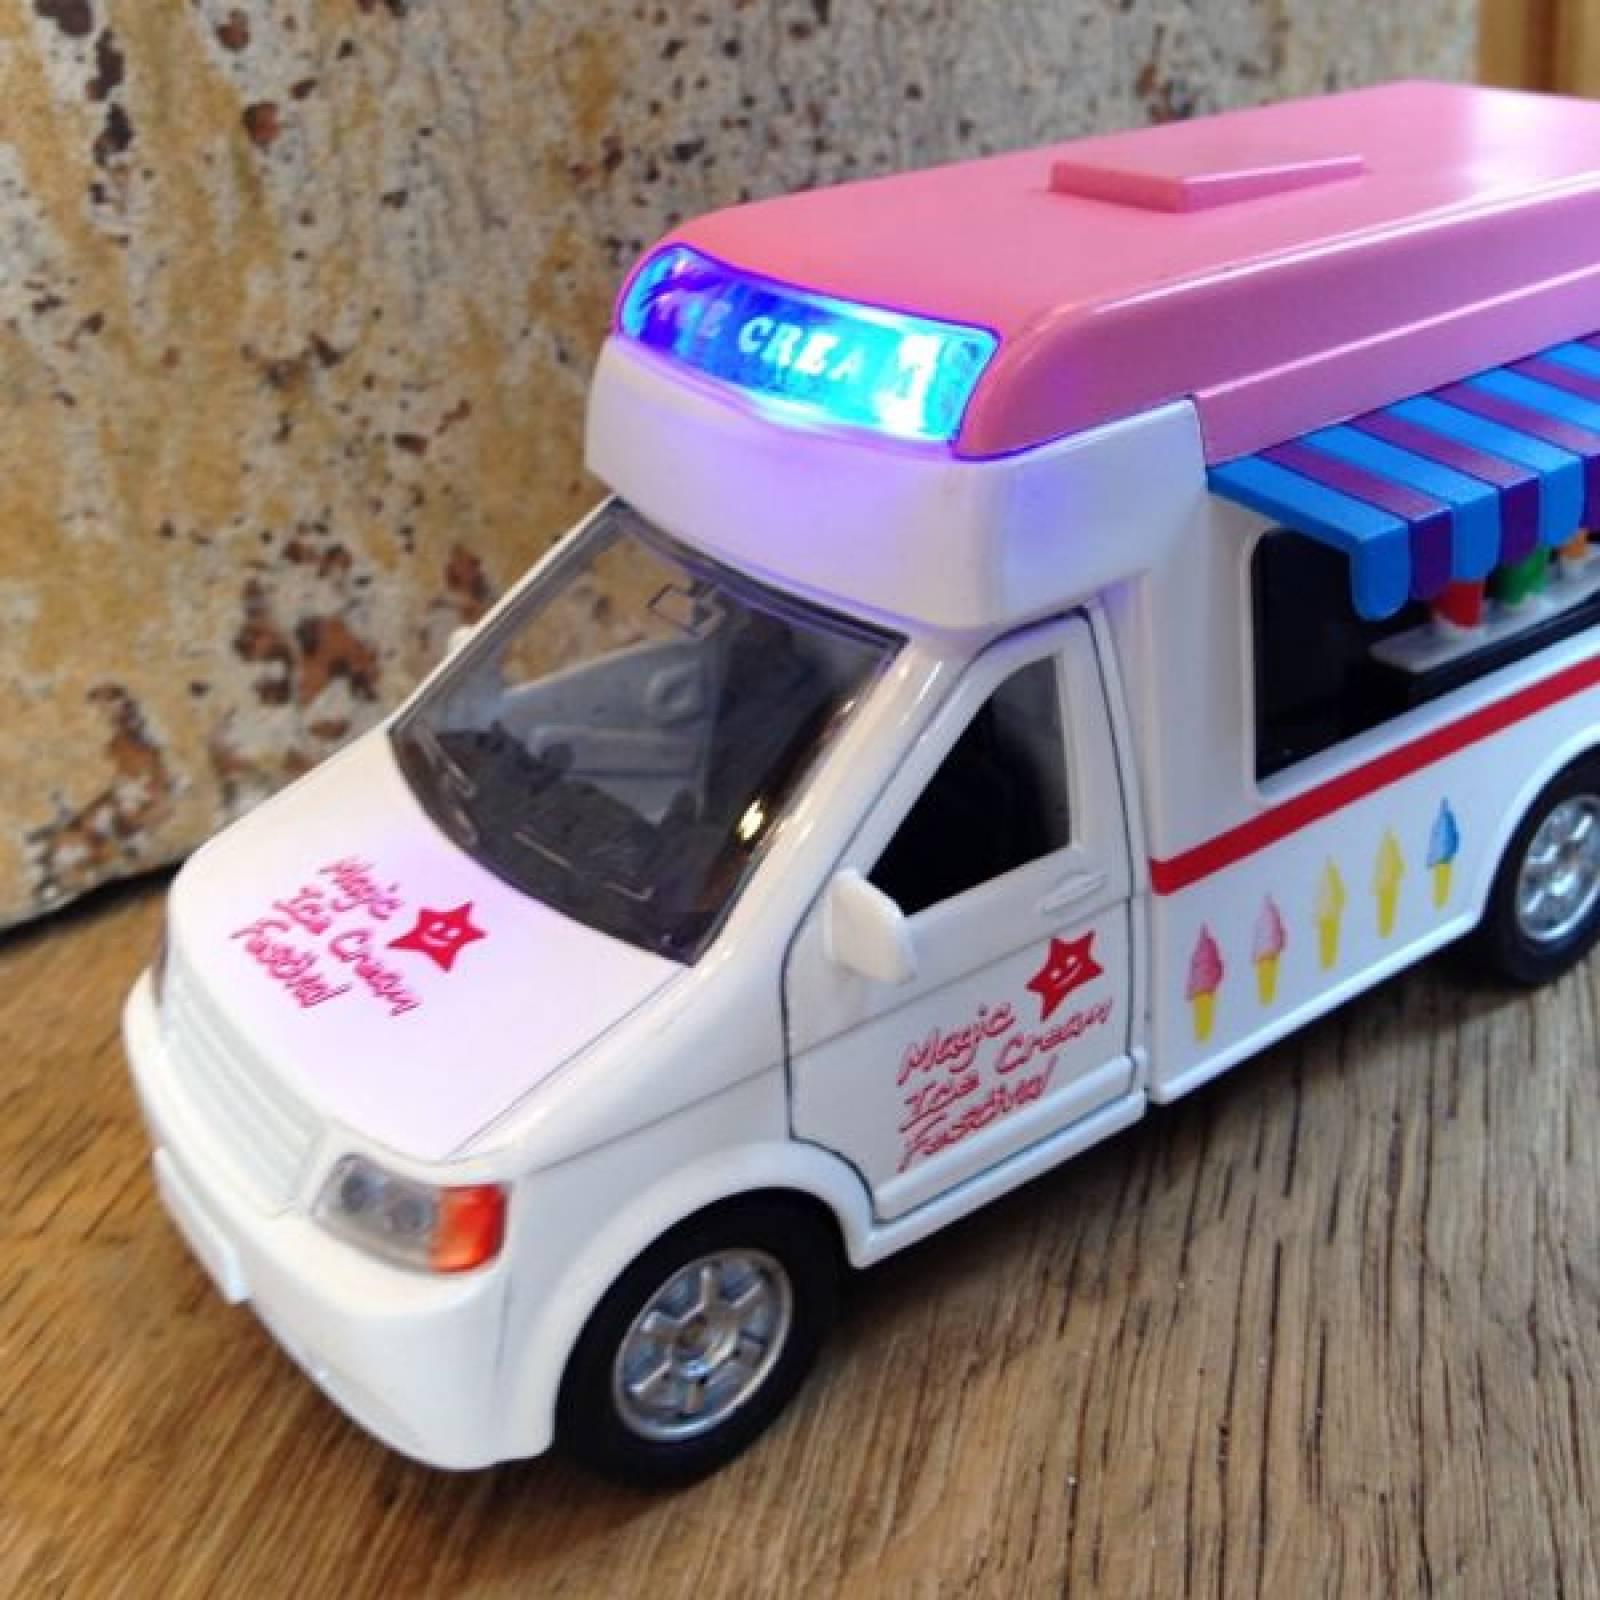 Teamsterz Ice Cream Van Toy Car